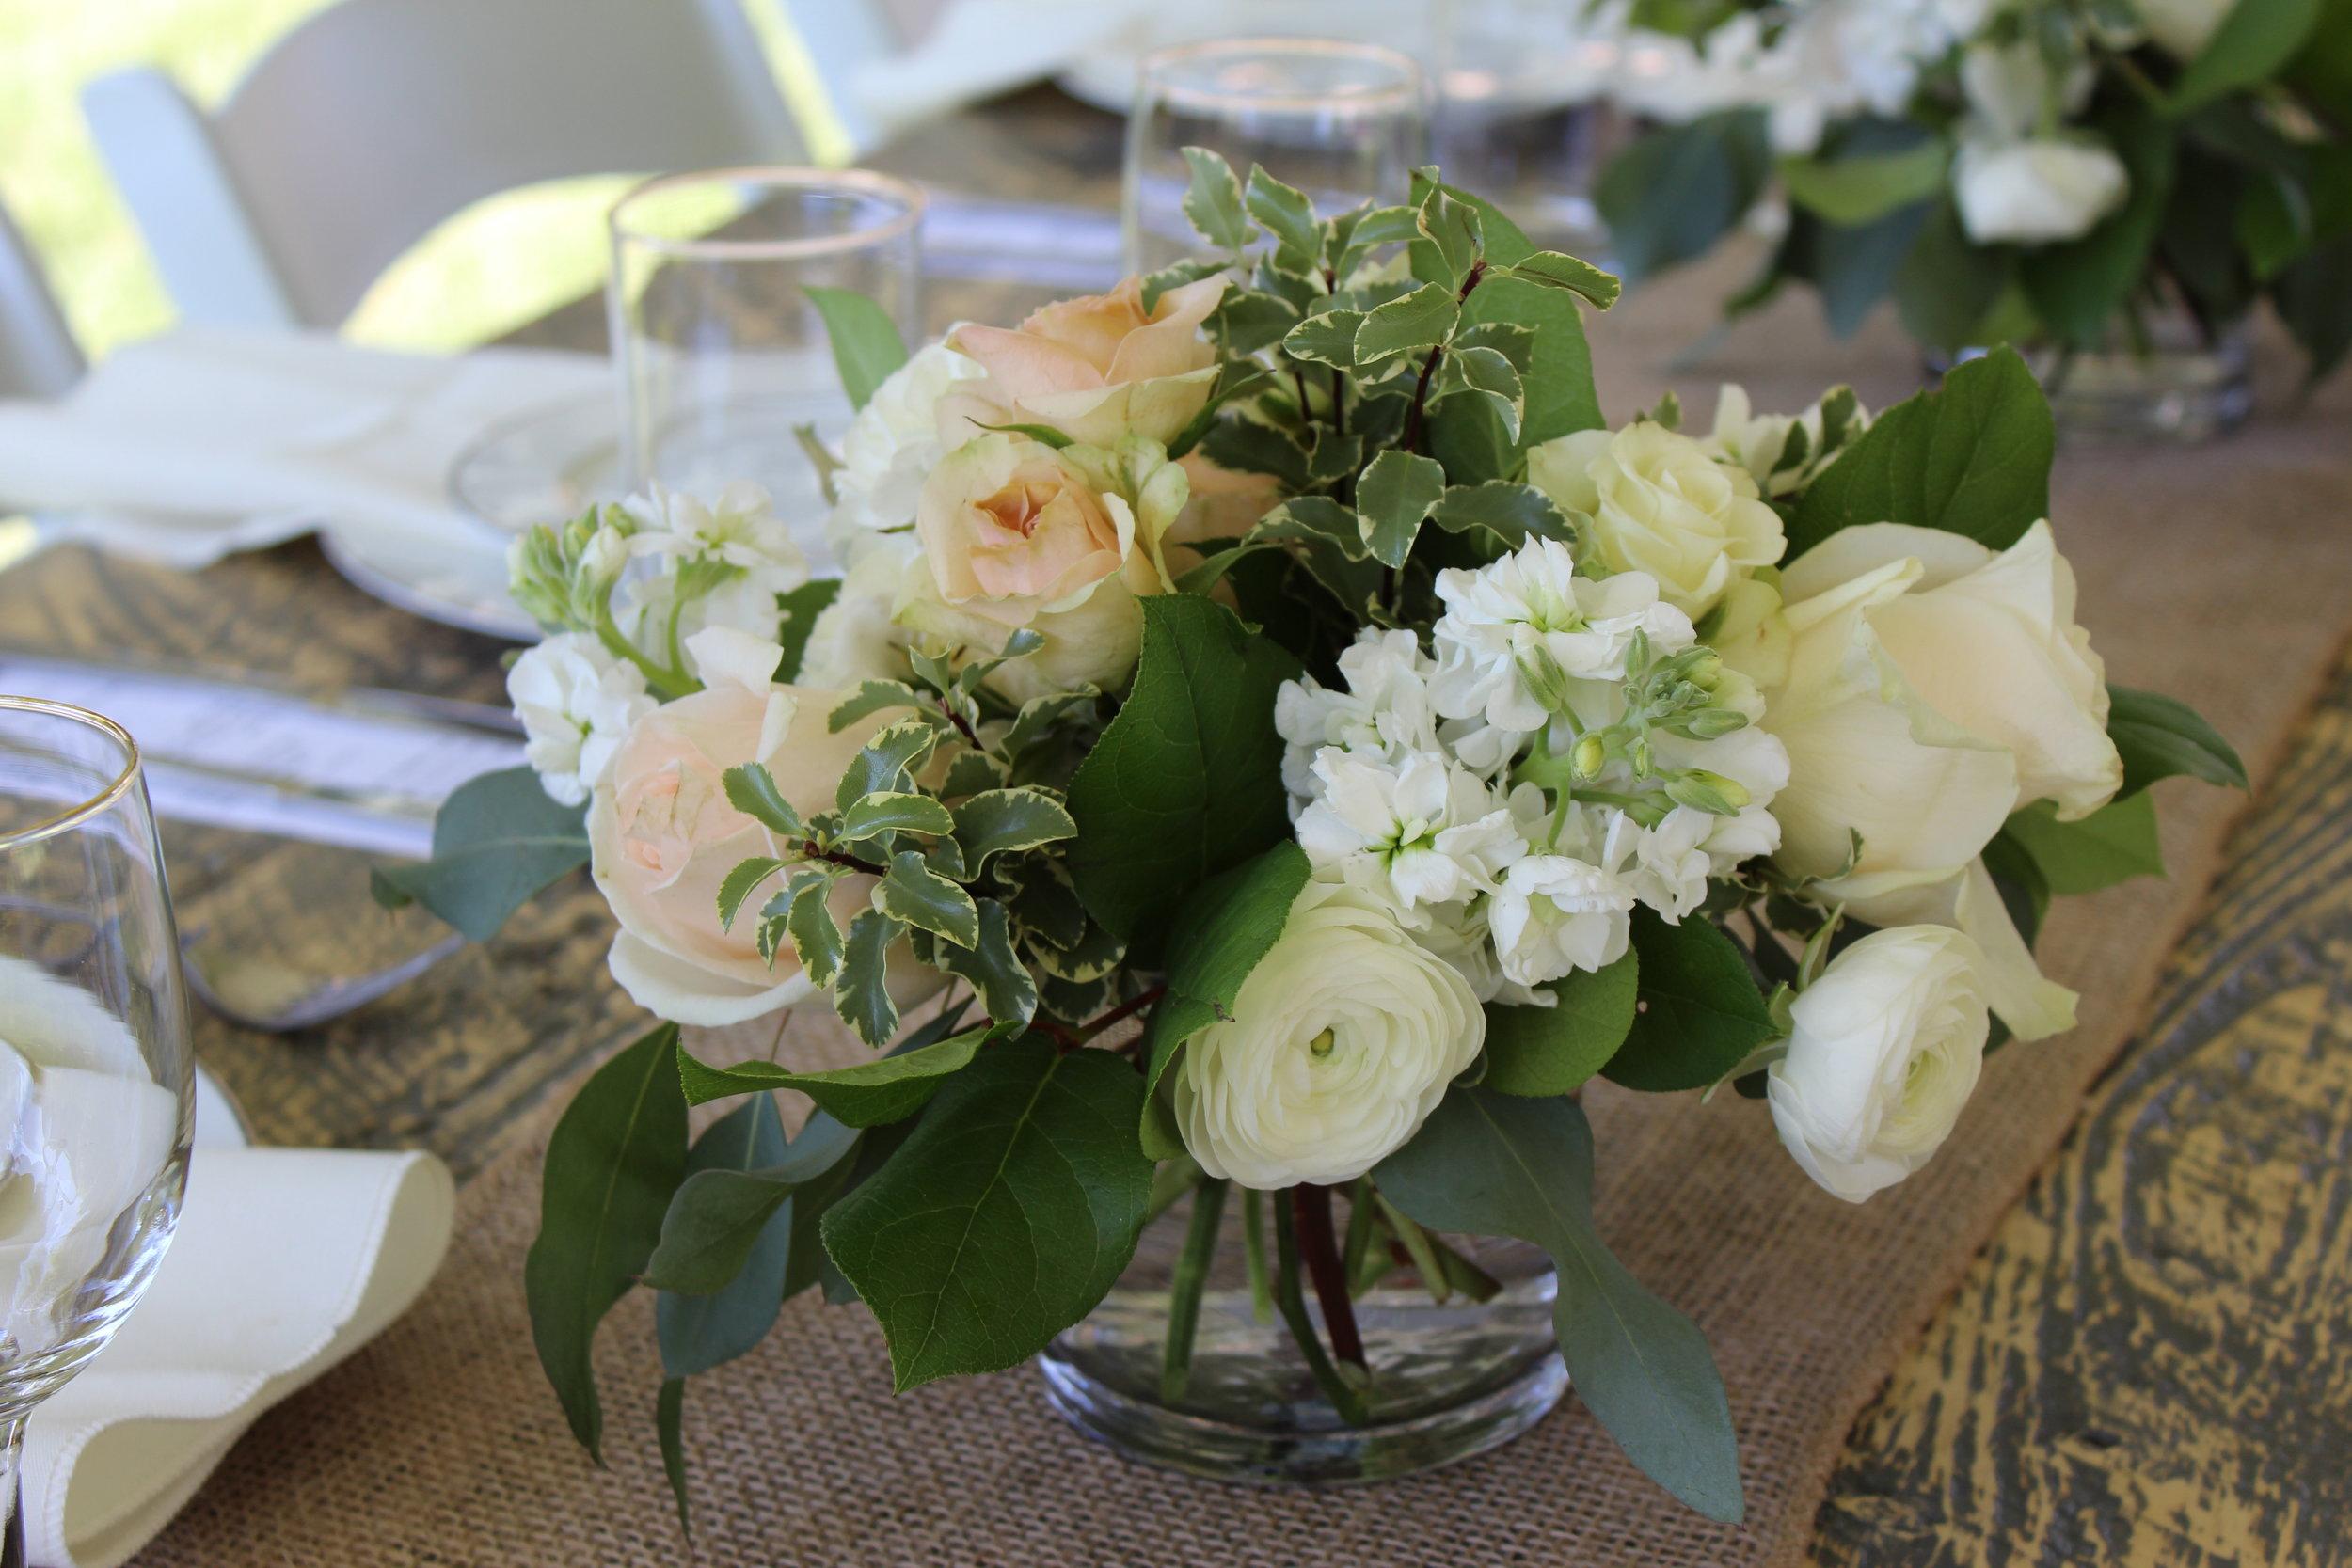 ashley-eileen-floral-design12.JPG